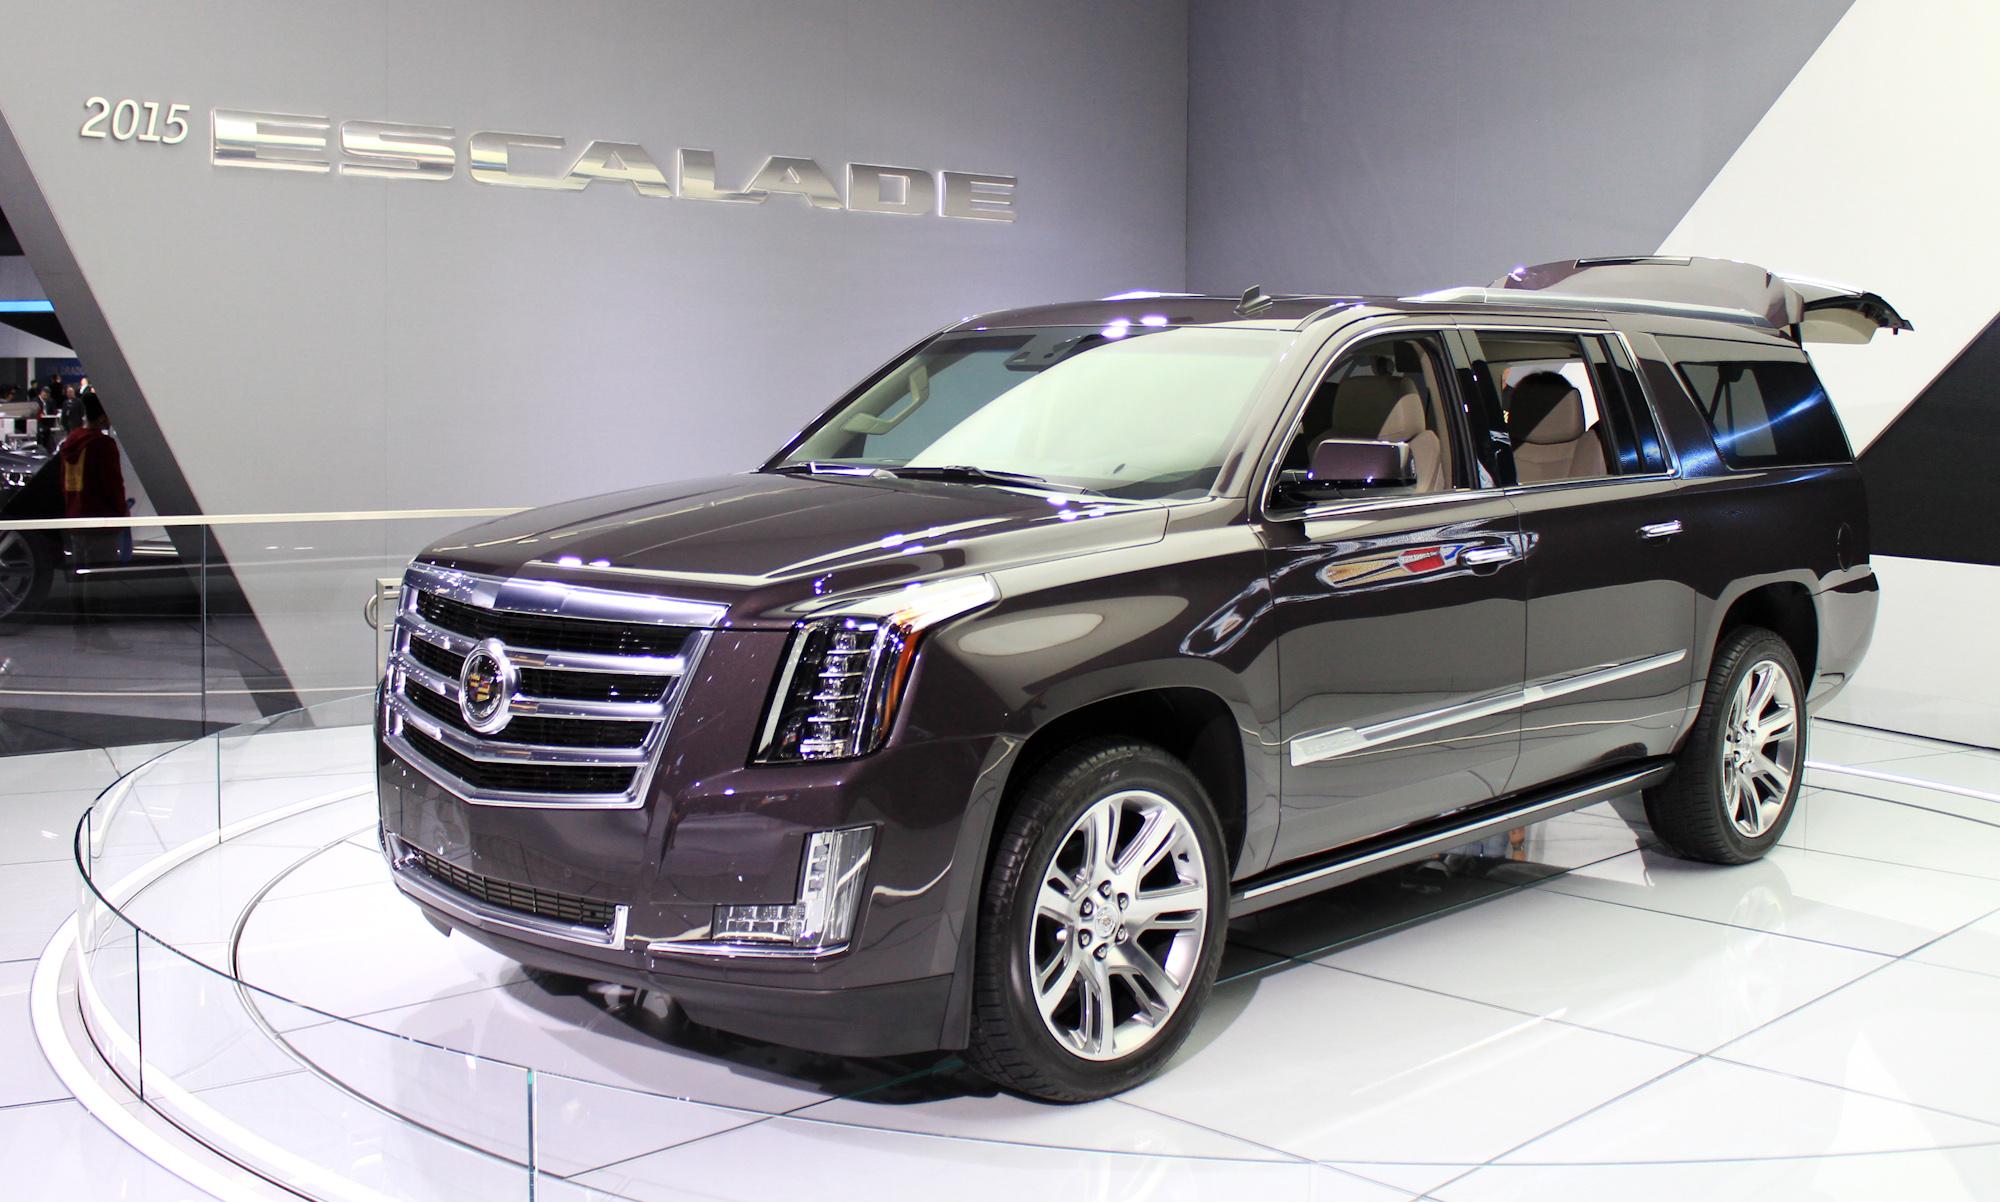 2015 Cadillac Escalade More Power Luxury Efficiency Live Photos